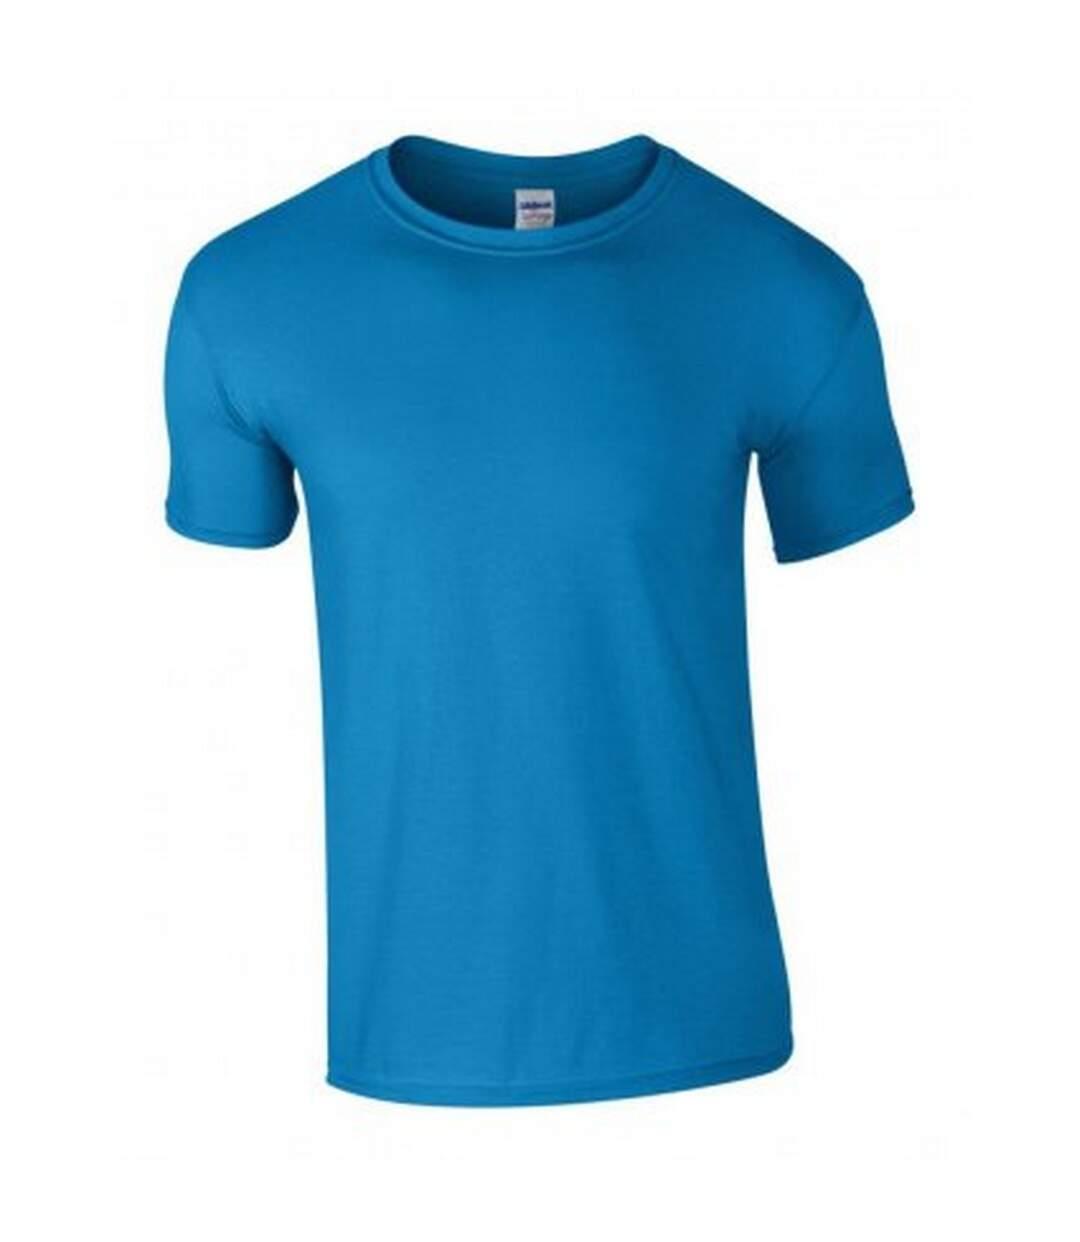 Gildan Mens Soft Style Ringspun T Shirt (Sapphire) - UTPC2882